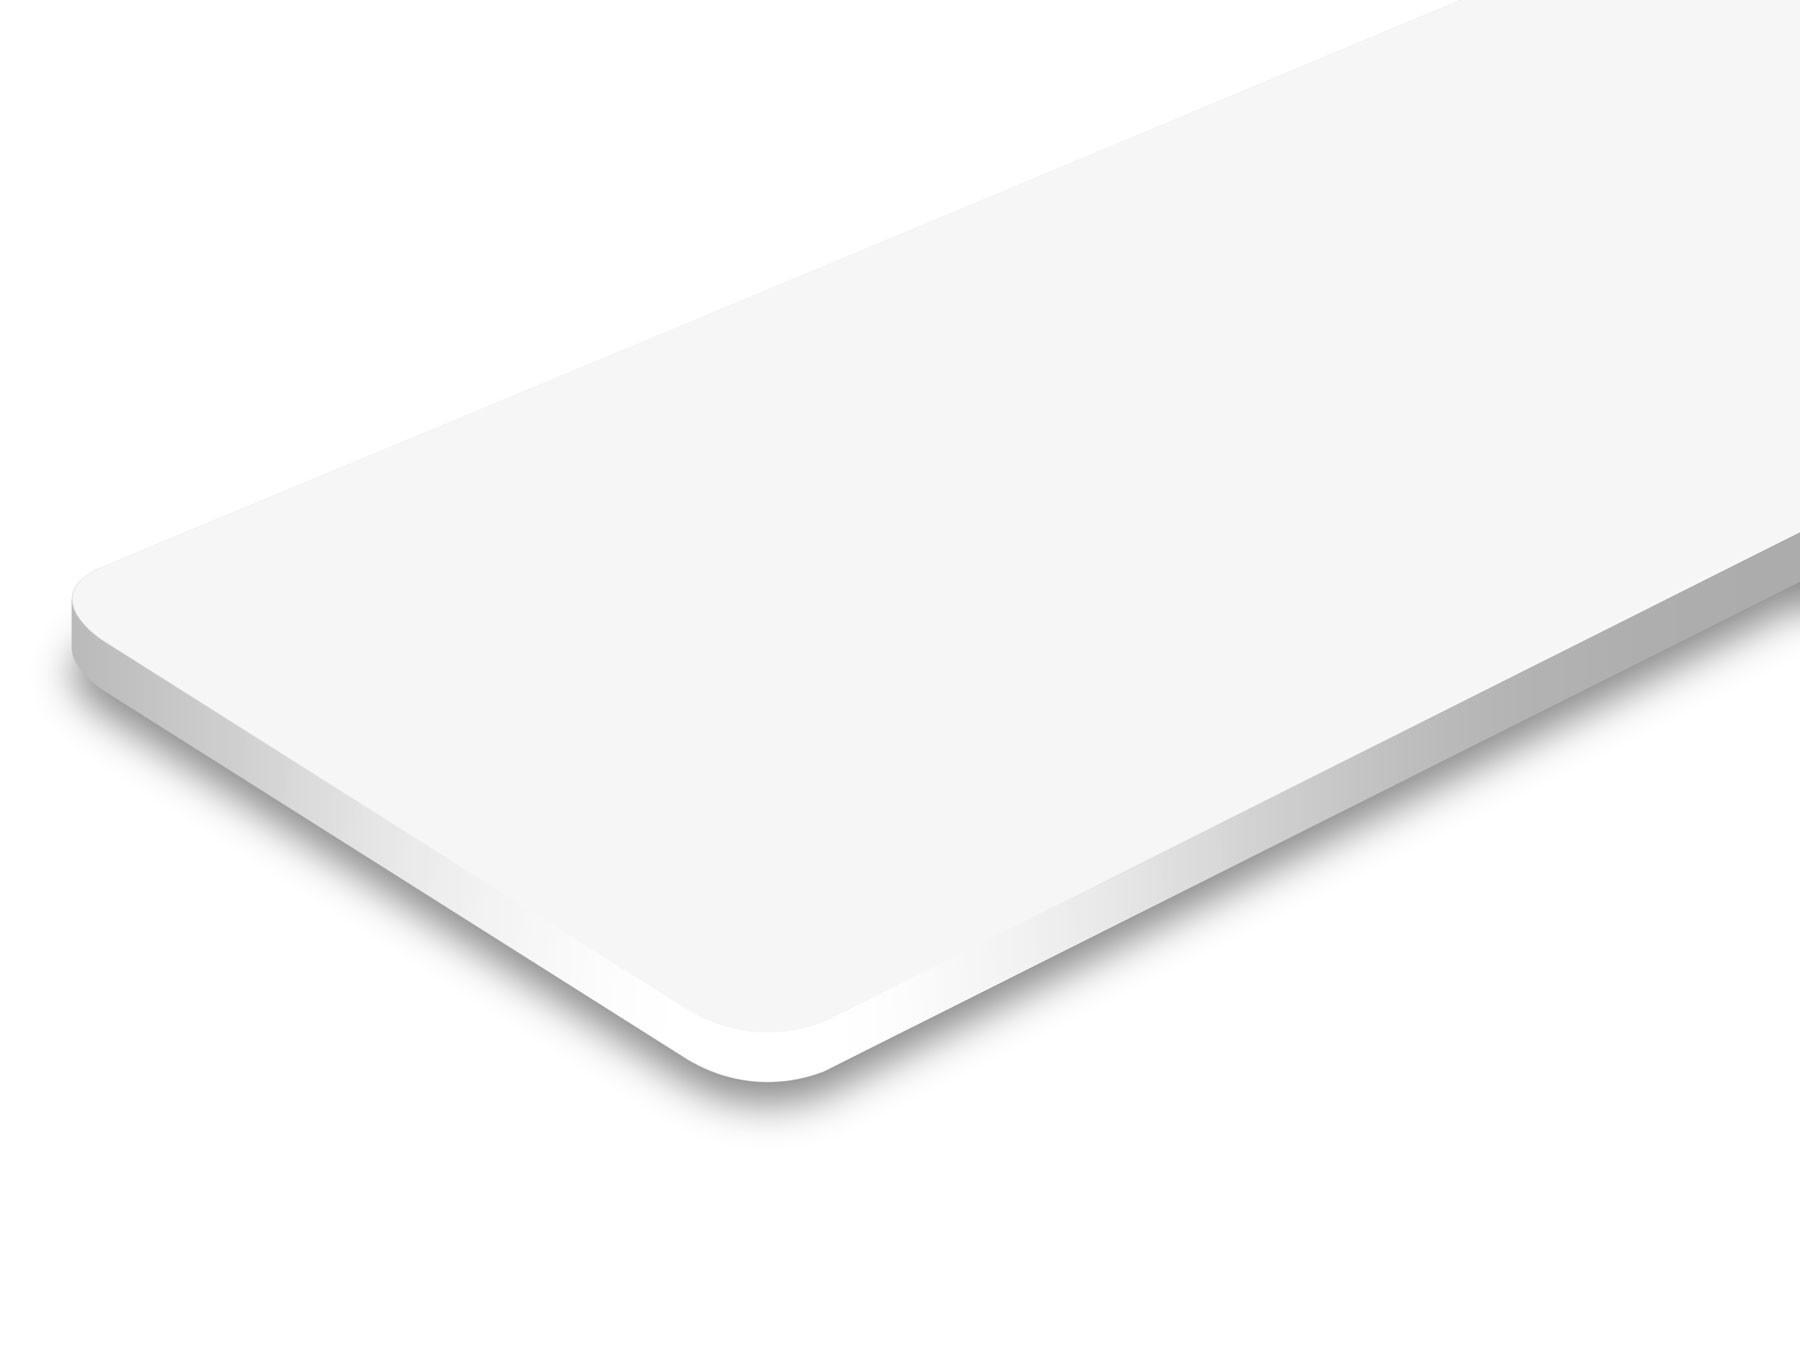 TroLase ADA Signage, Bright White, 1ply, 0.8 mm